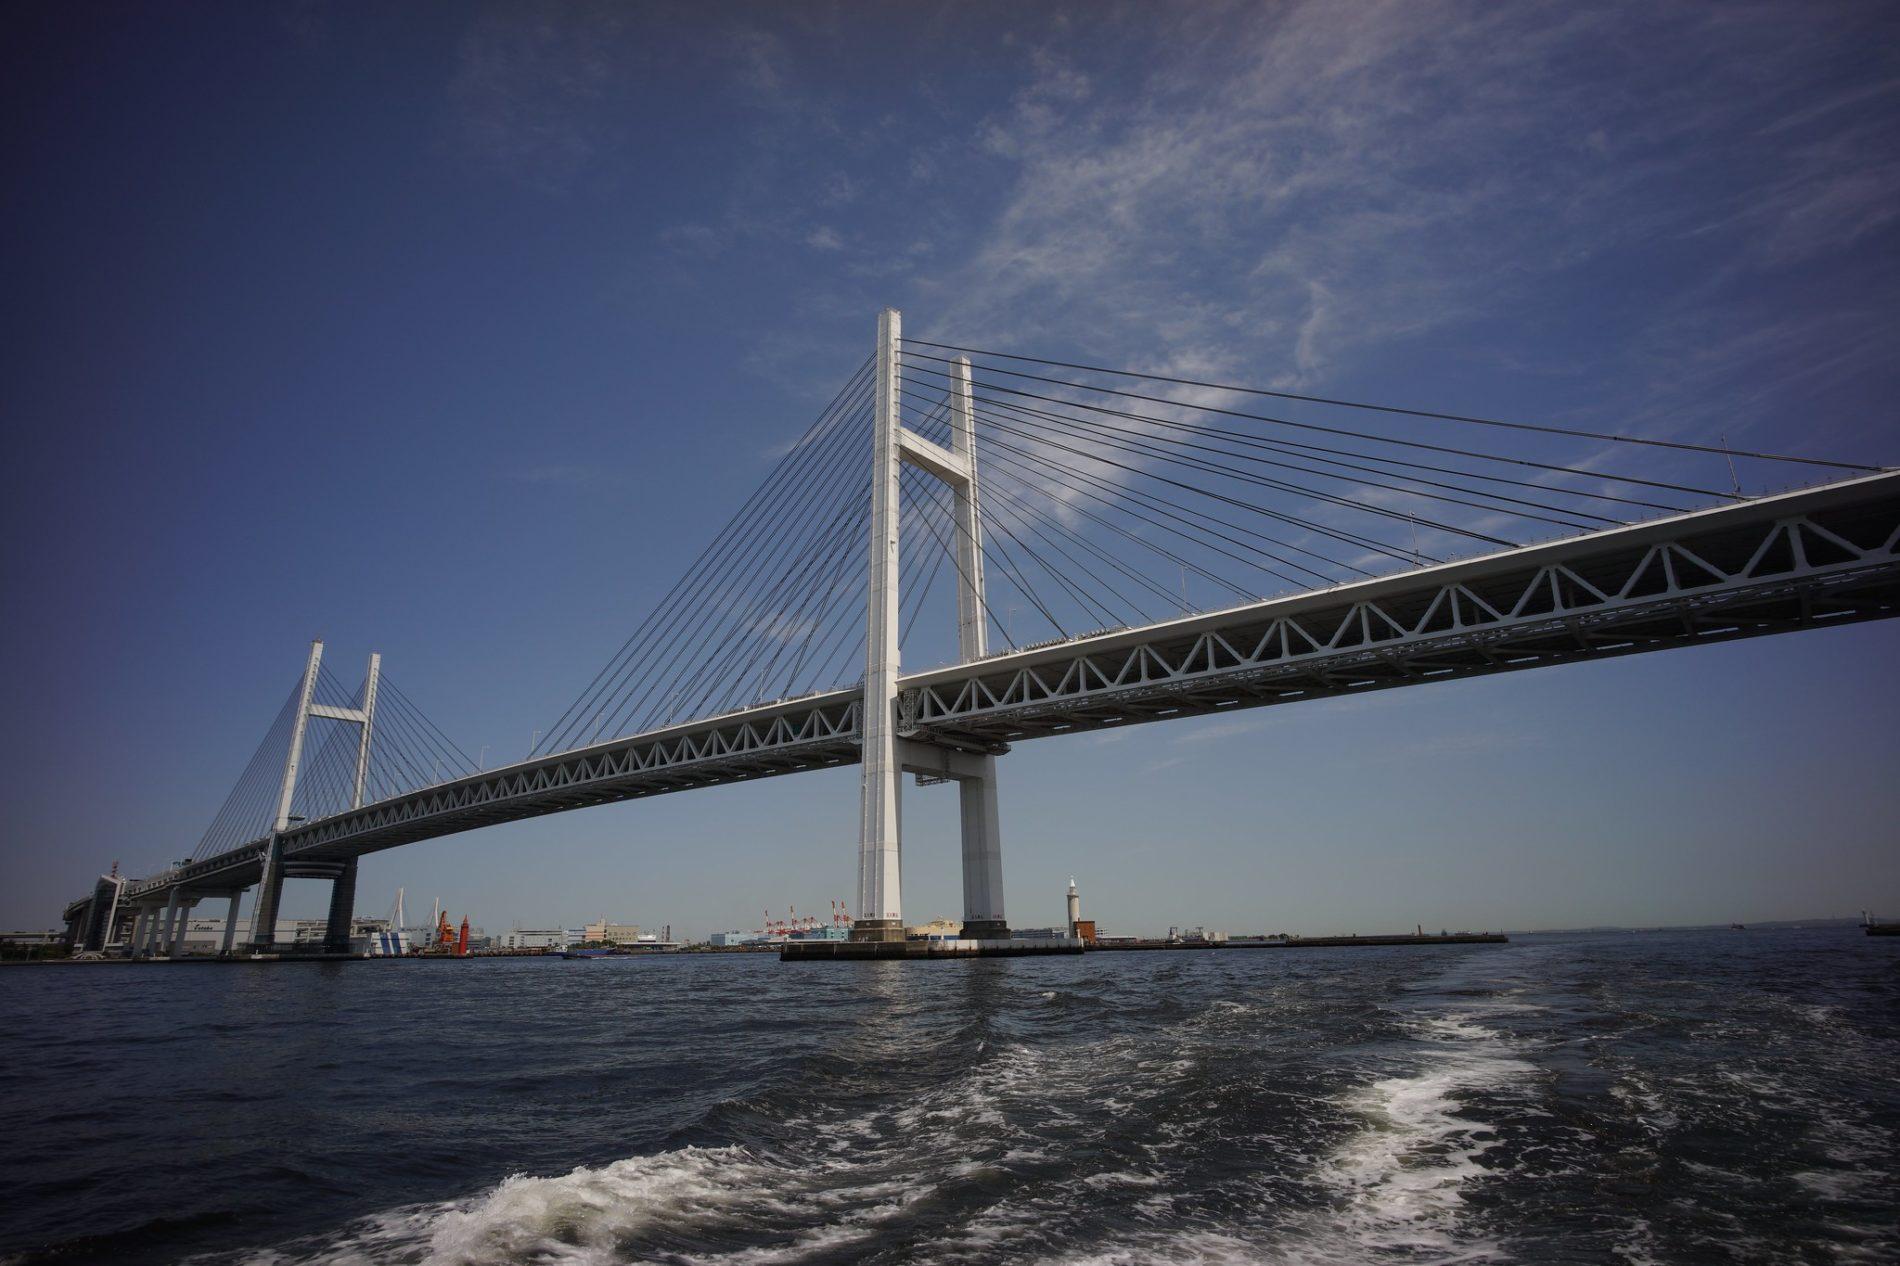 Fester Bestandteil von Yokohamas Skyline: die Yokohama Bay Bridge. (Foto: zengame auf Flickr)